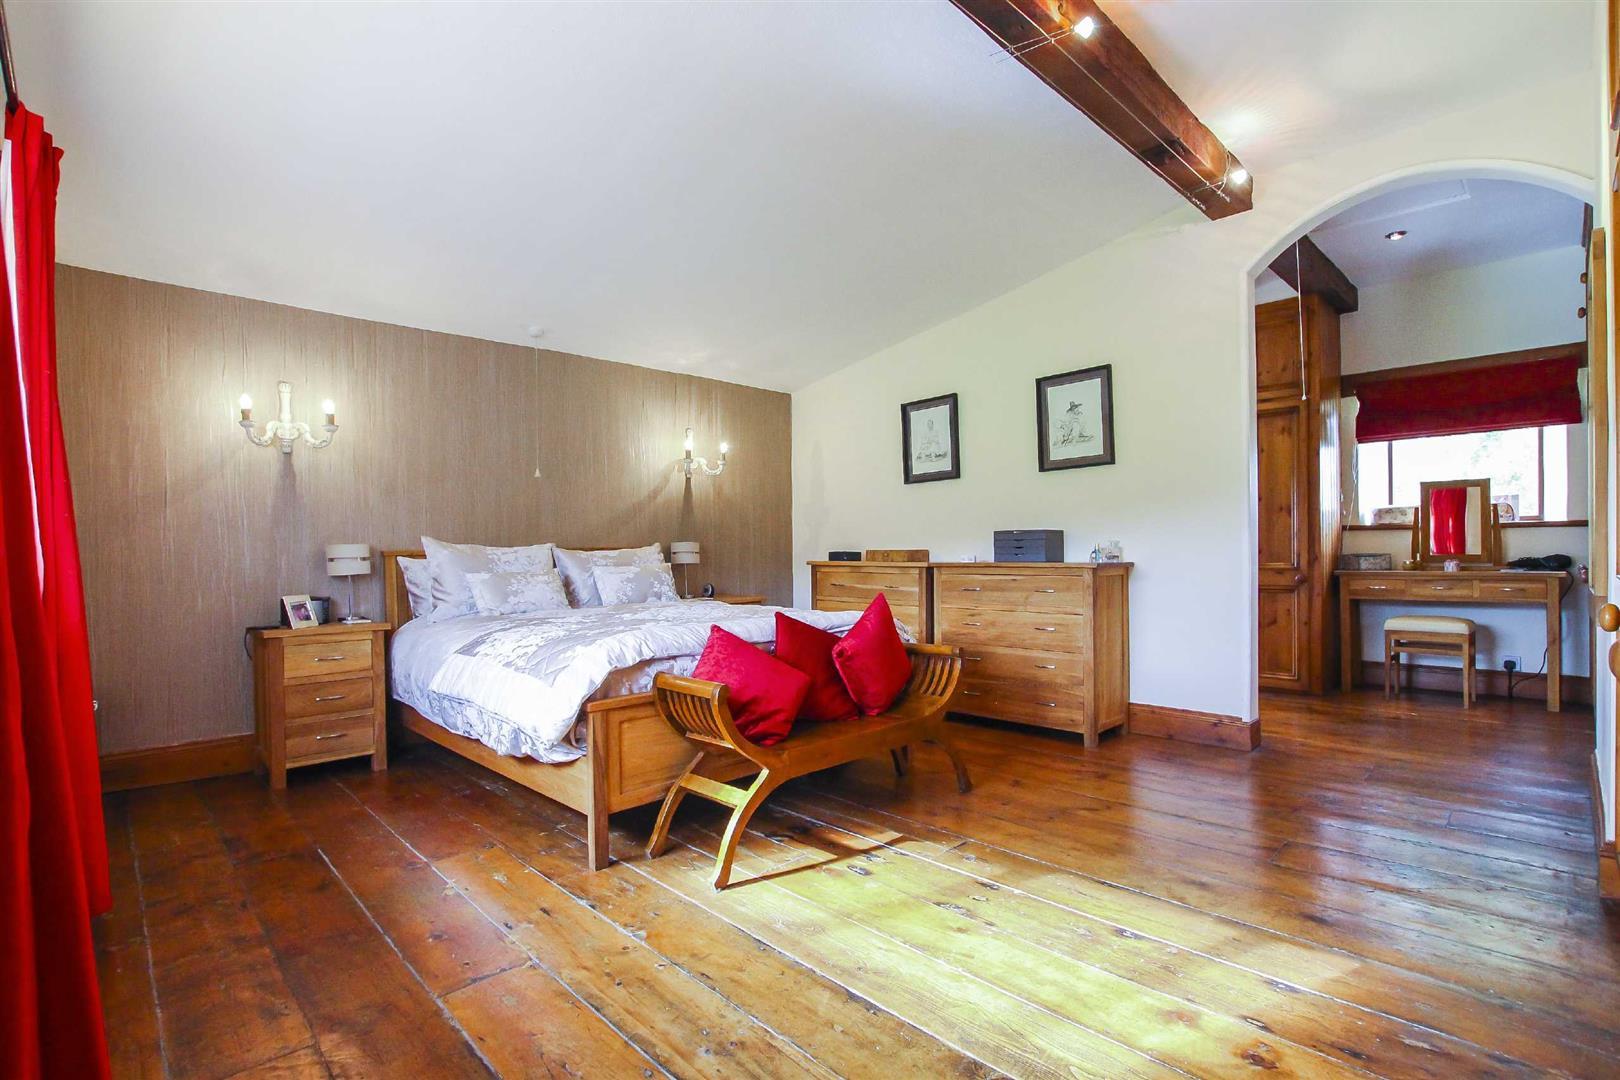 5 Bedroom Barn Conversion For Sale - p026519_05.jpg